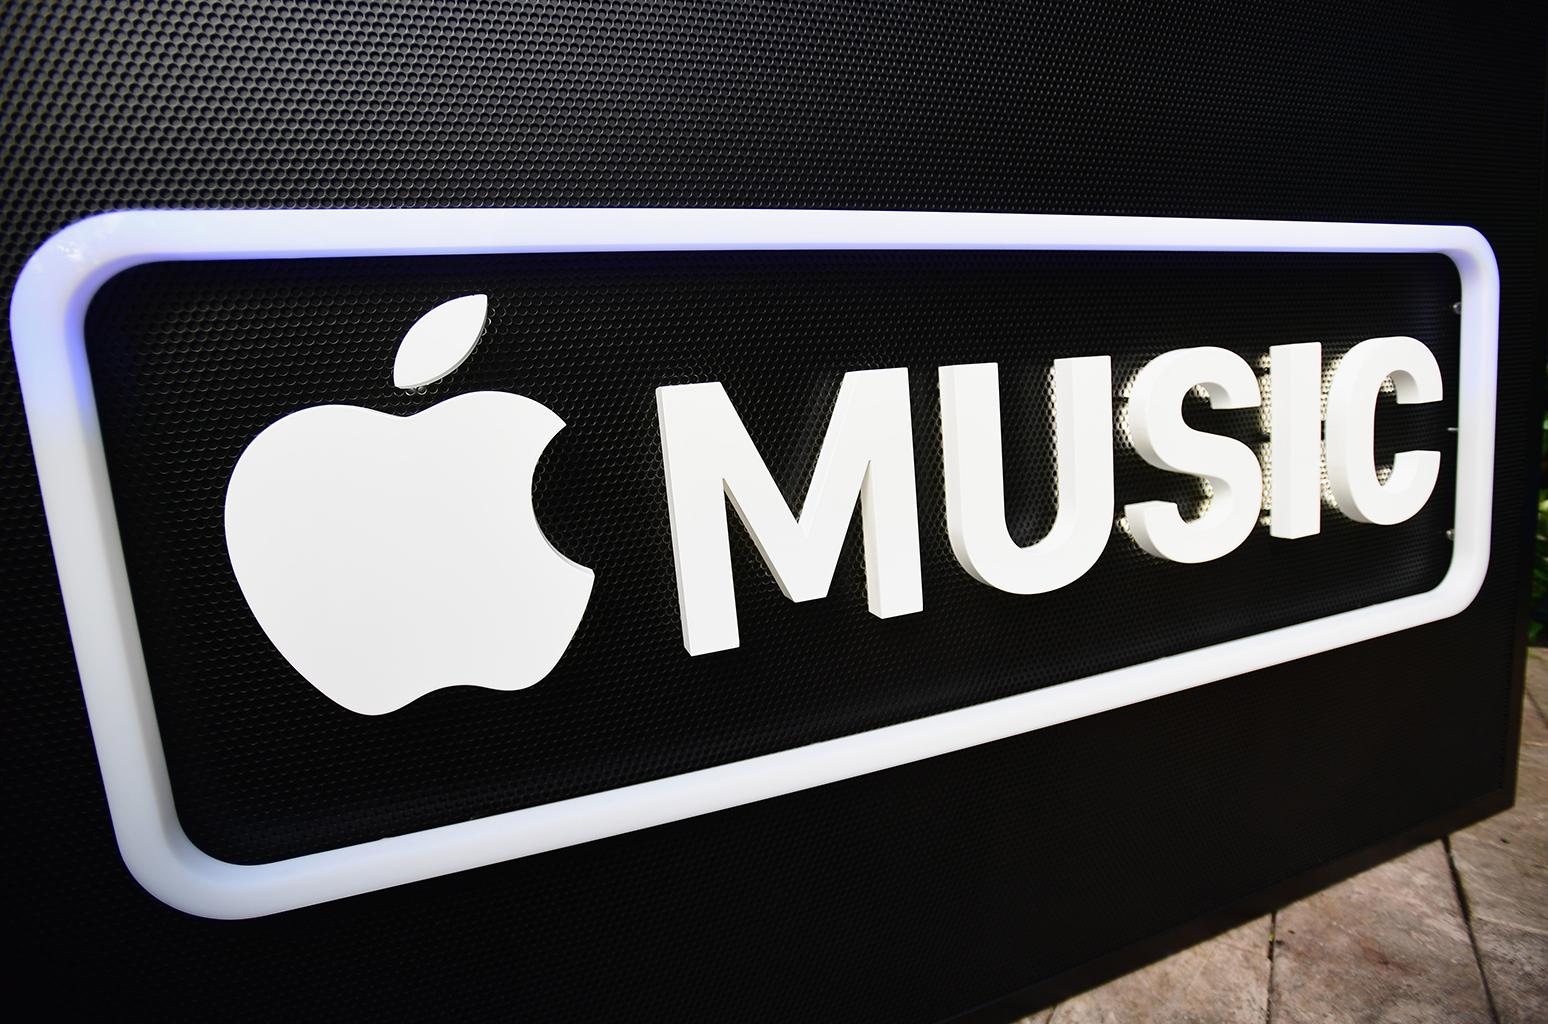 苹果推出 Digital Masters 计划,提升 Apple Music 音质